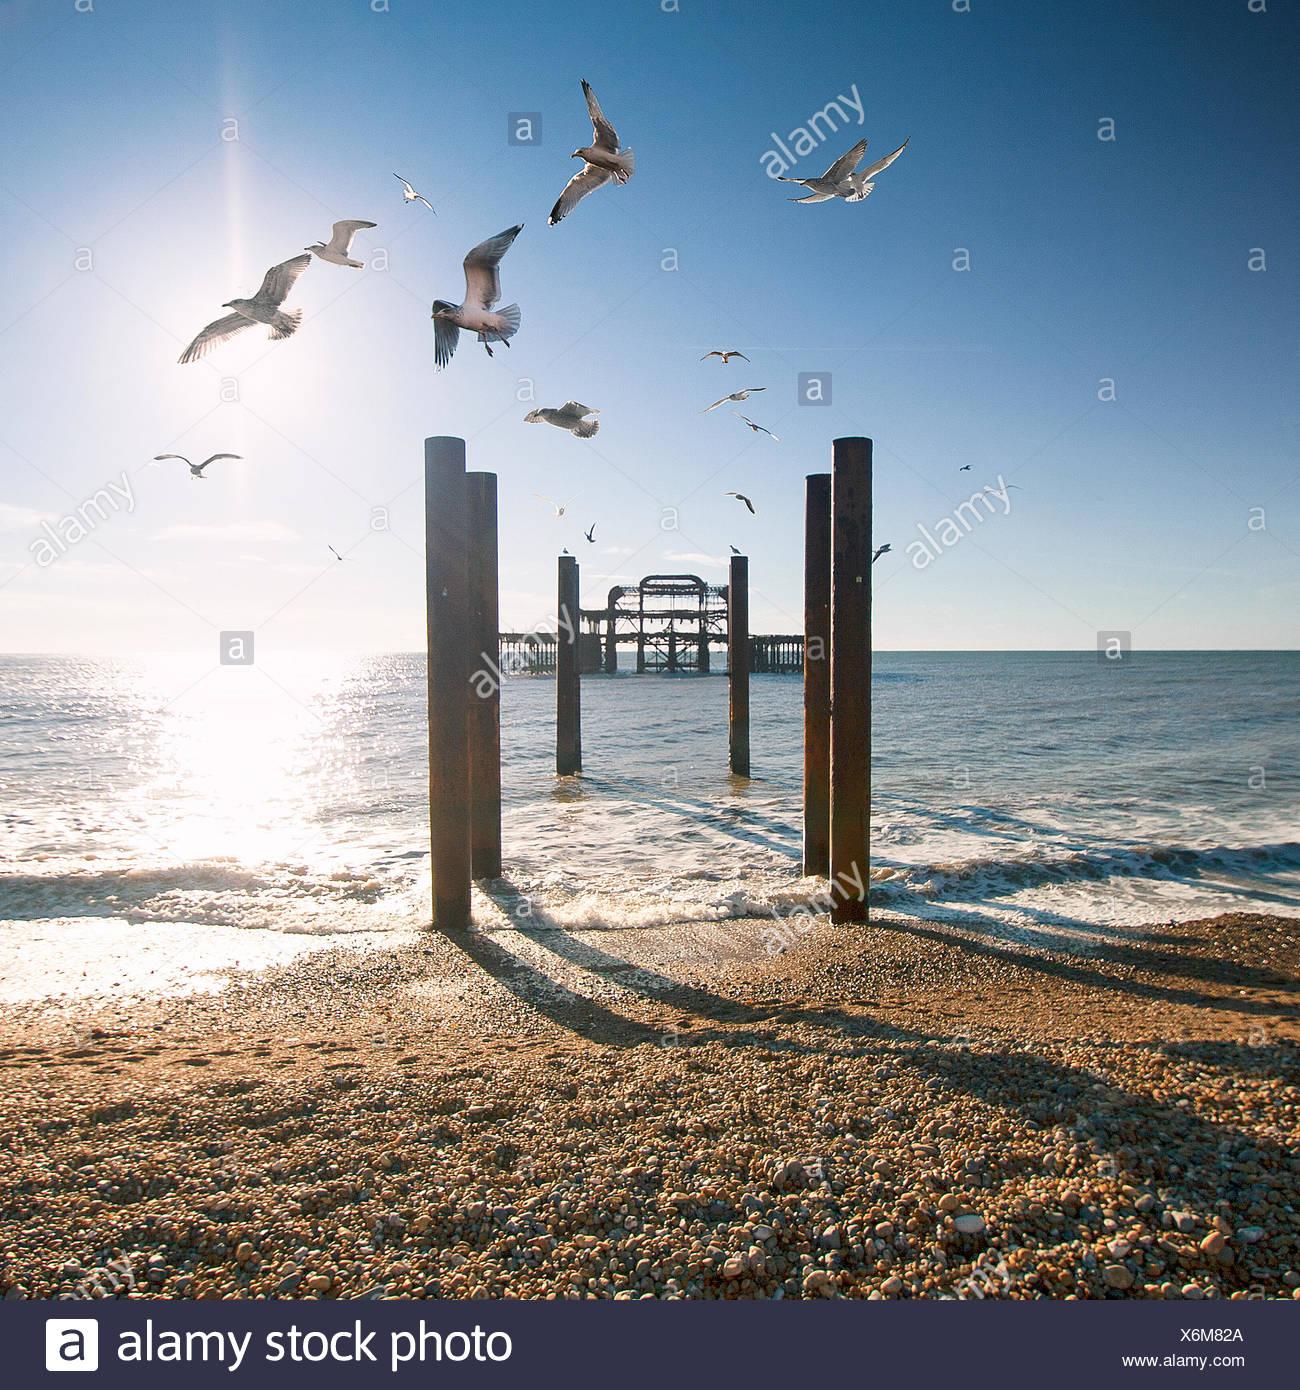 Brighton West Pier, East Sussex, England, UK - Stock Image